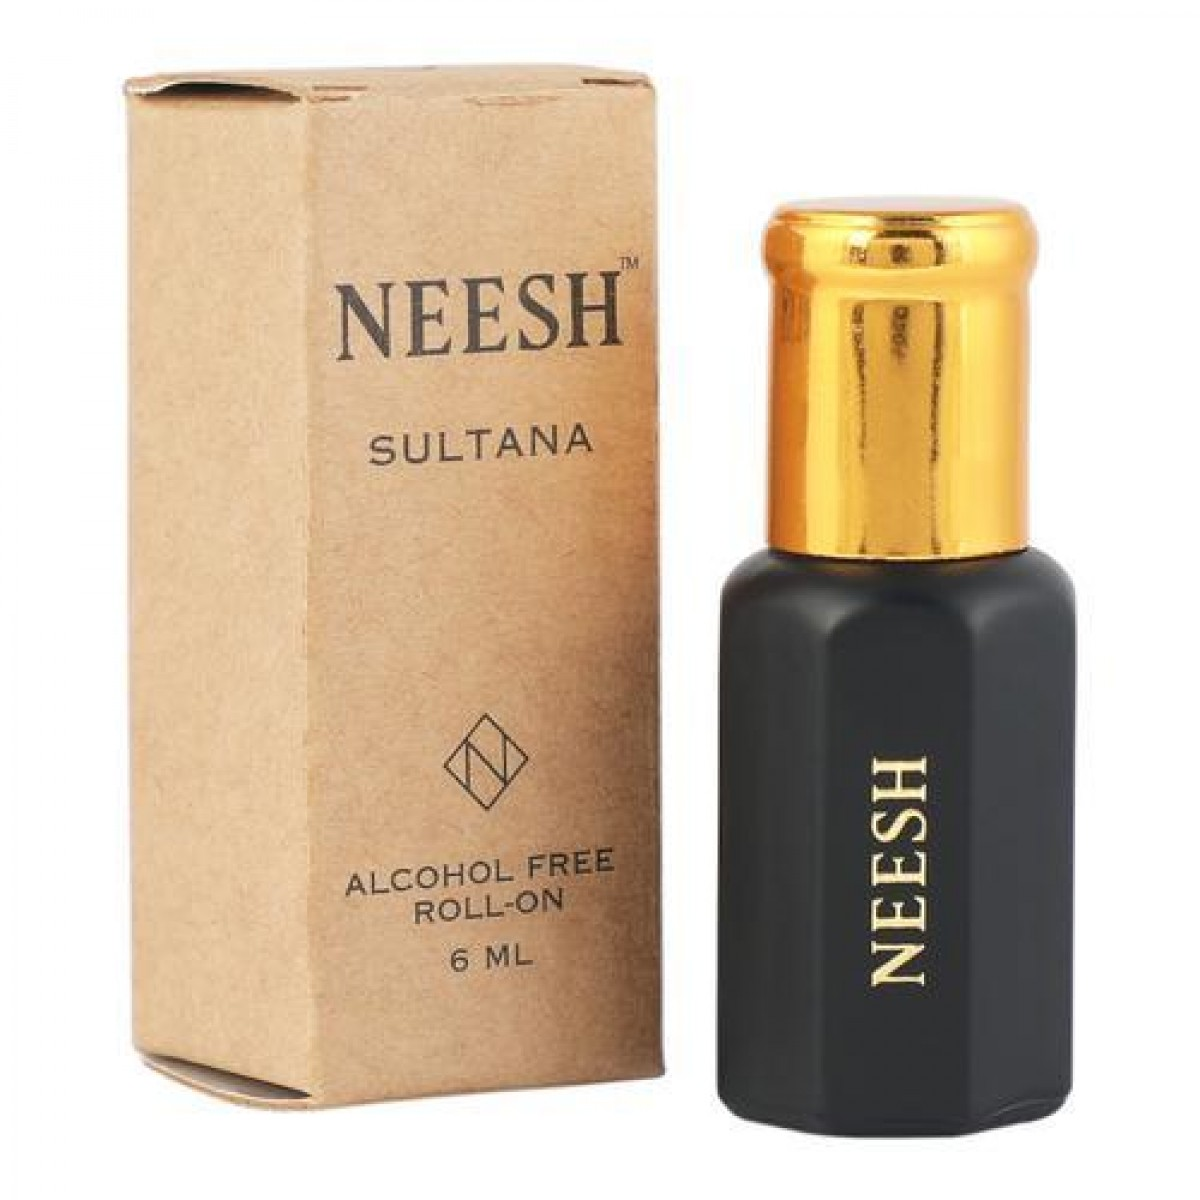 Perfumy w olejku Oud-de-Venice typu roll on